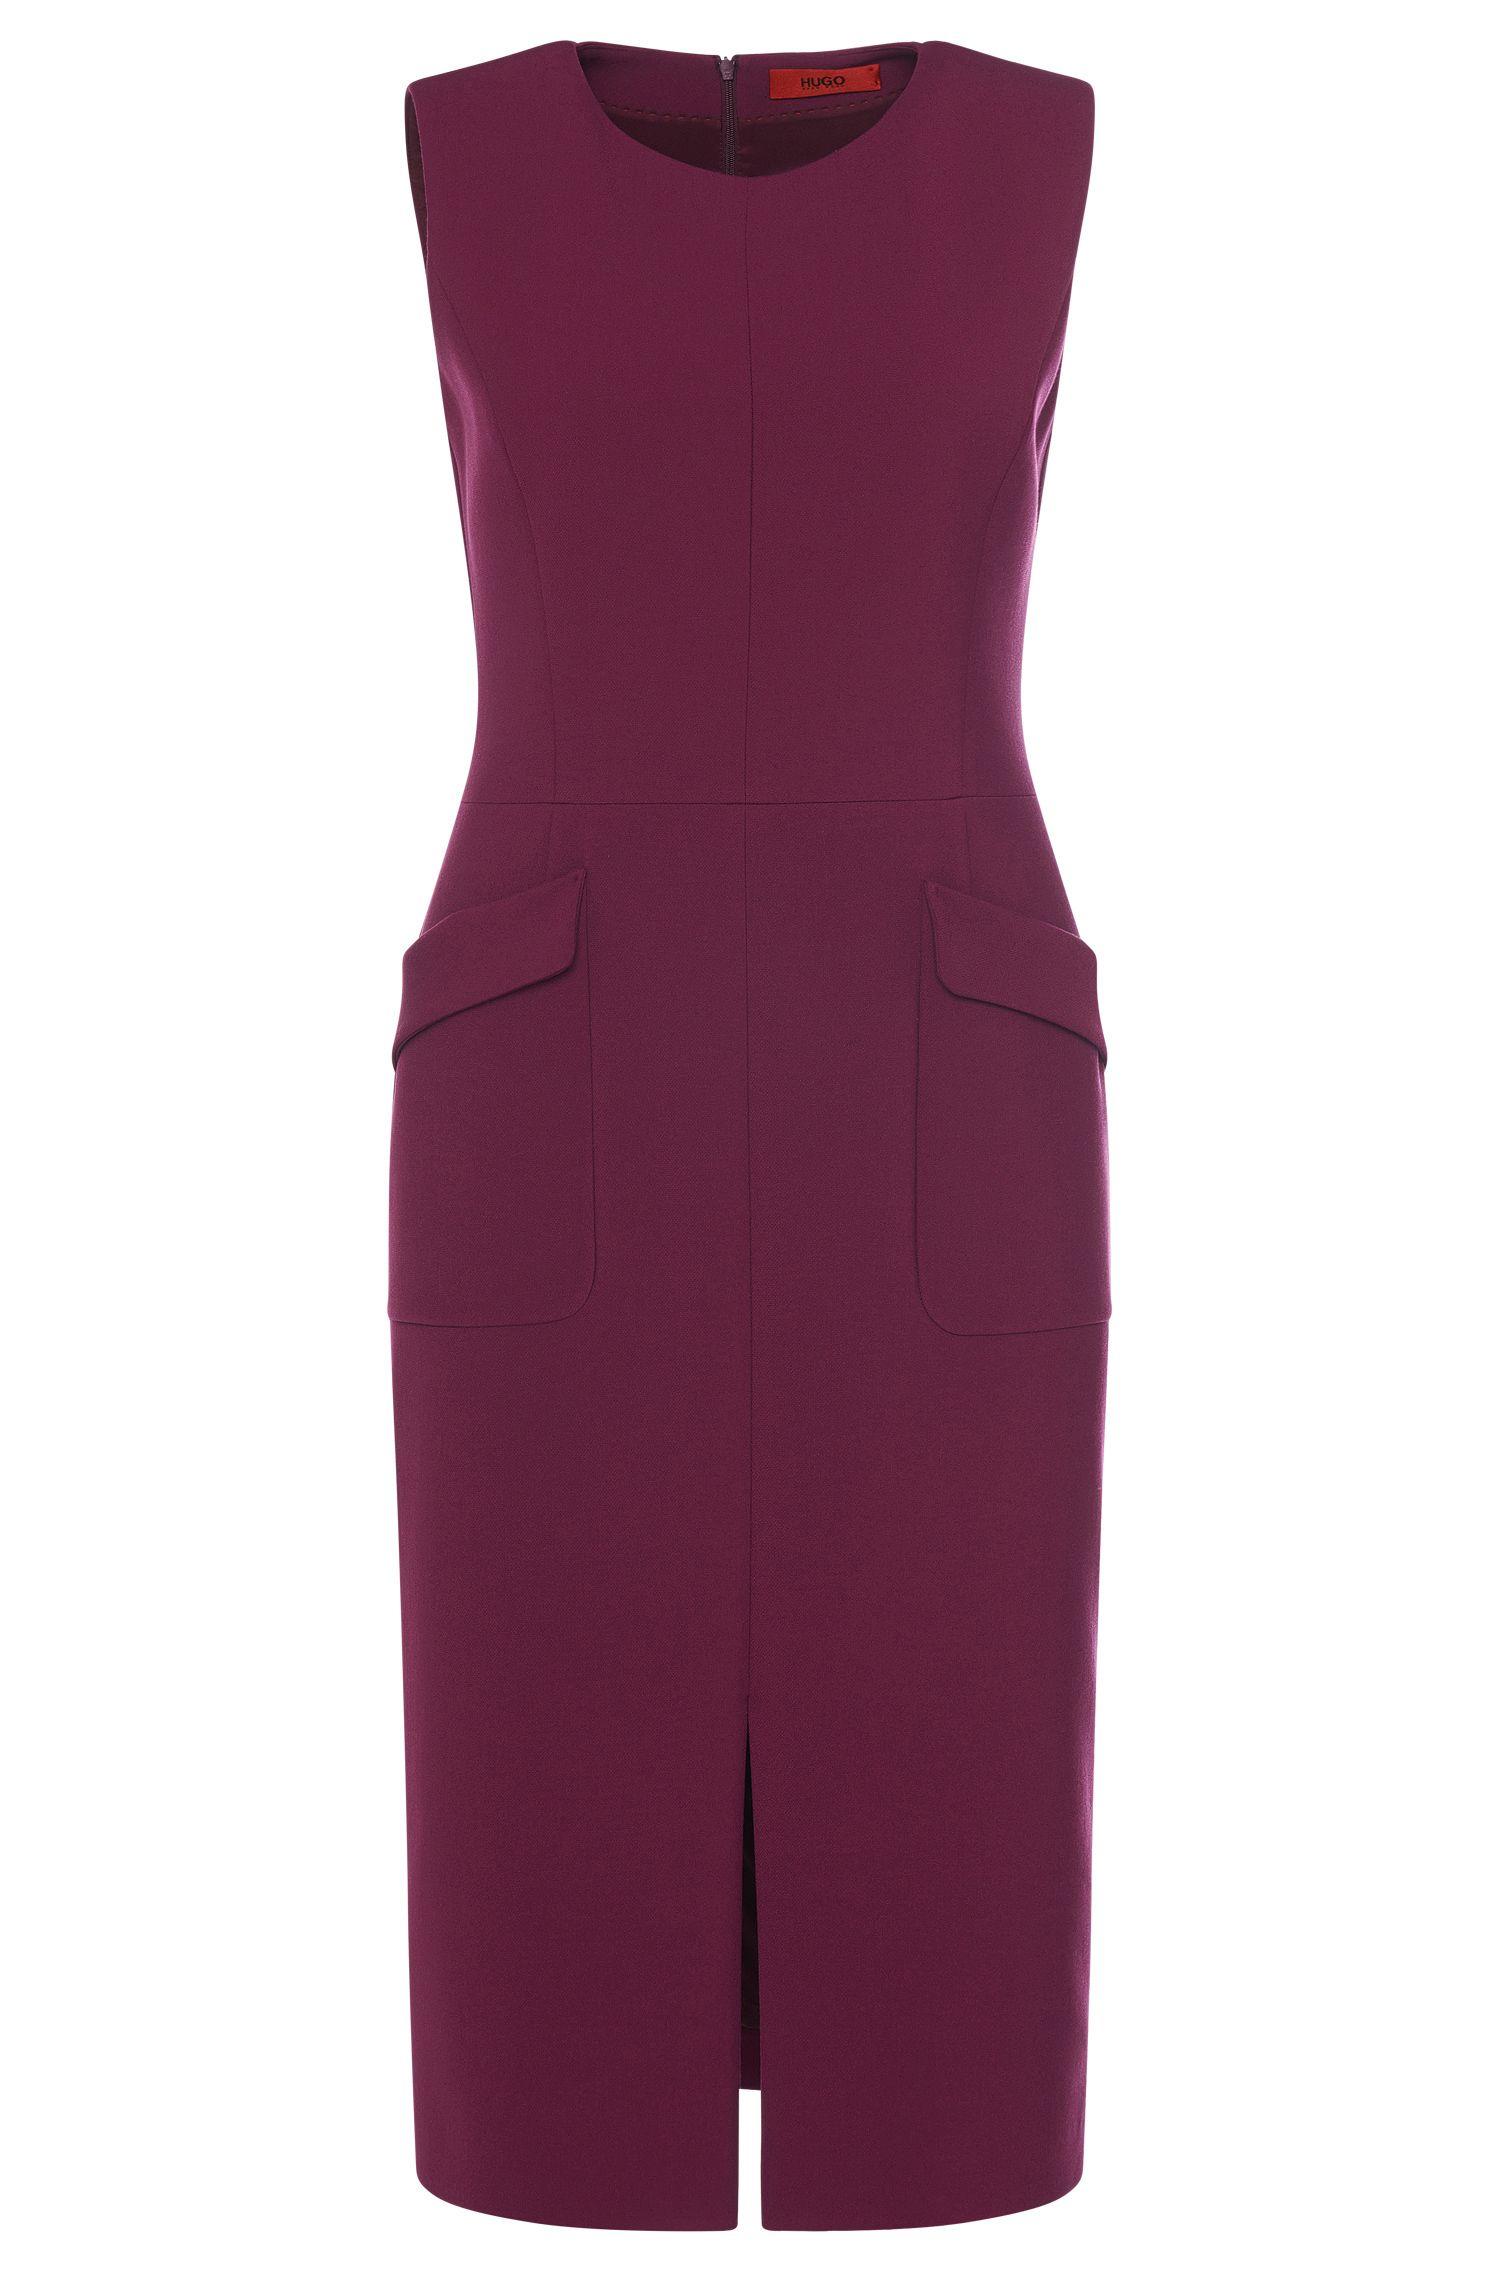 Nauwsluitende jurk met opgezette zakken: 'Klenni'